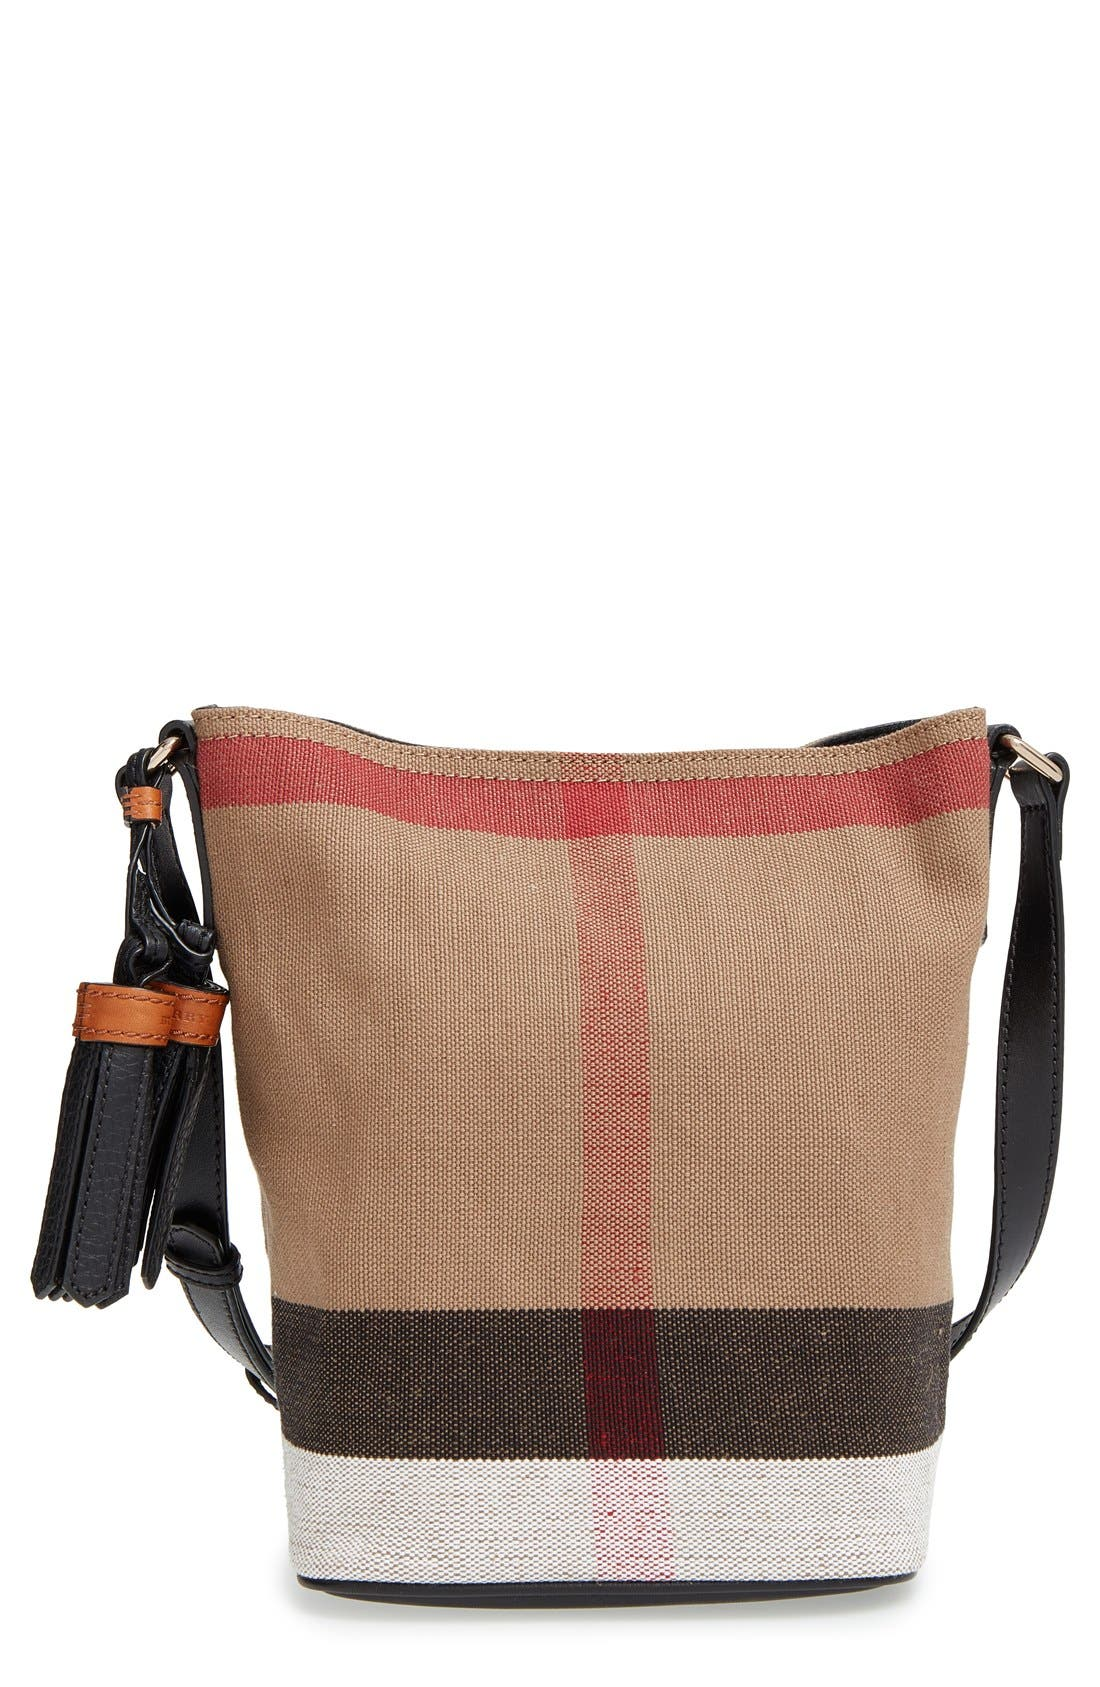 Burberry 'Mini Susanna' Canvas Check Bucket Bag